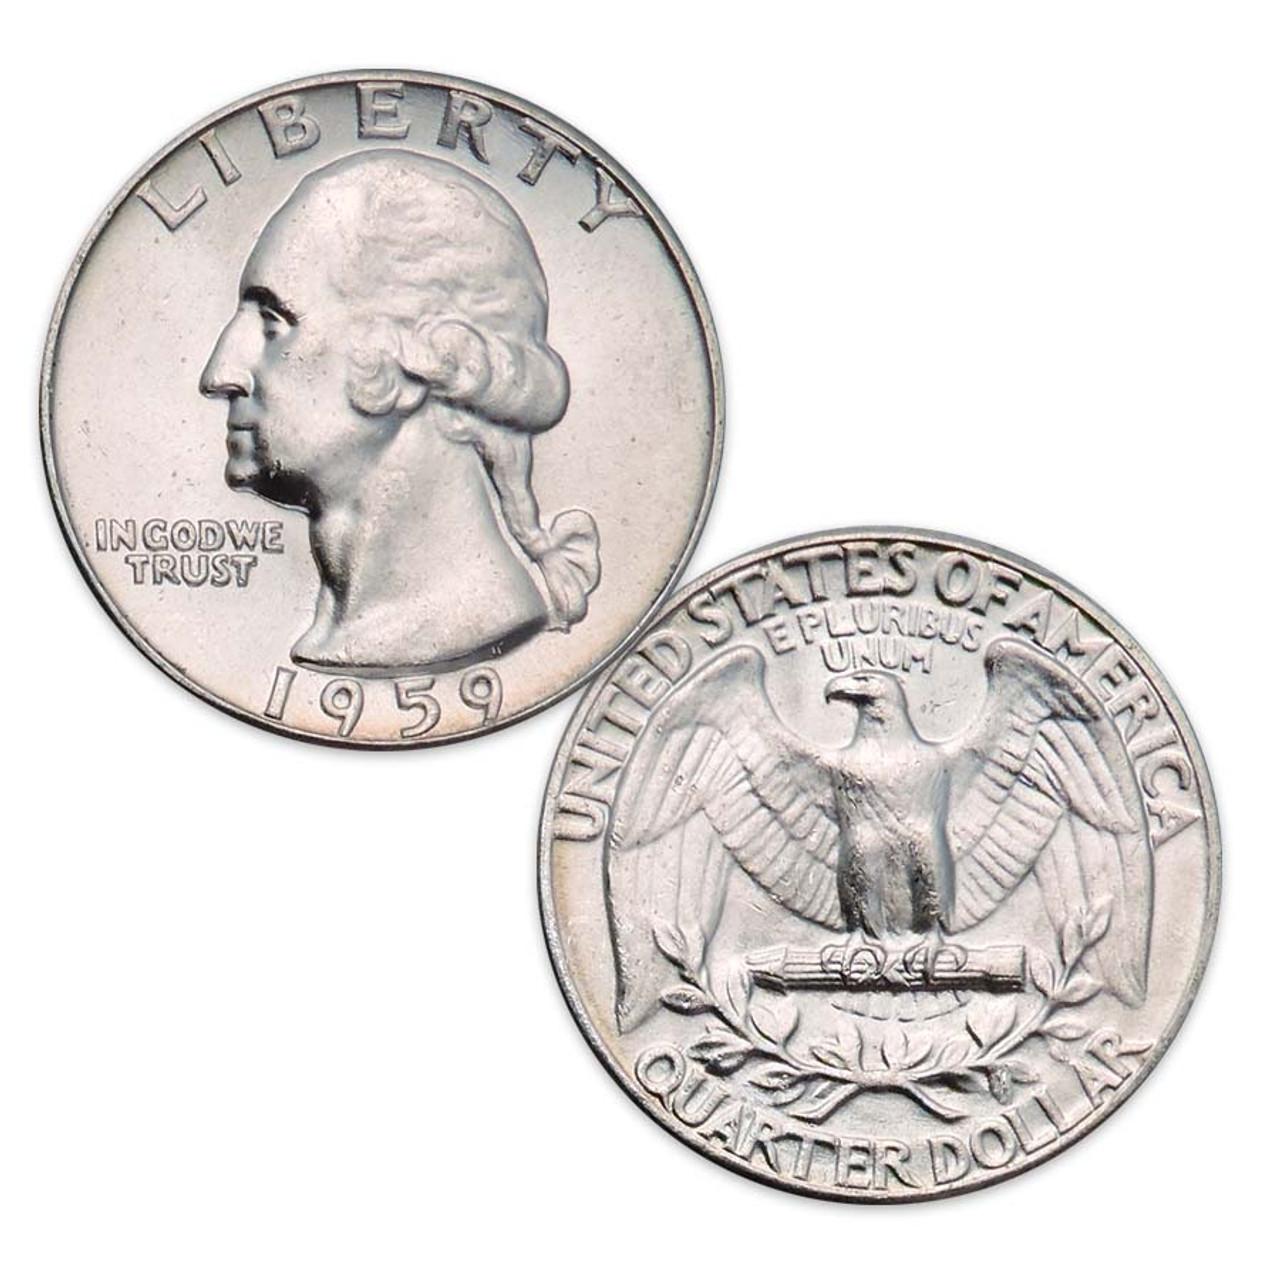 1959-P Washington Silver Quarter Brilliant Uncirculated Image 1